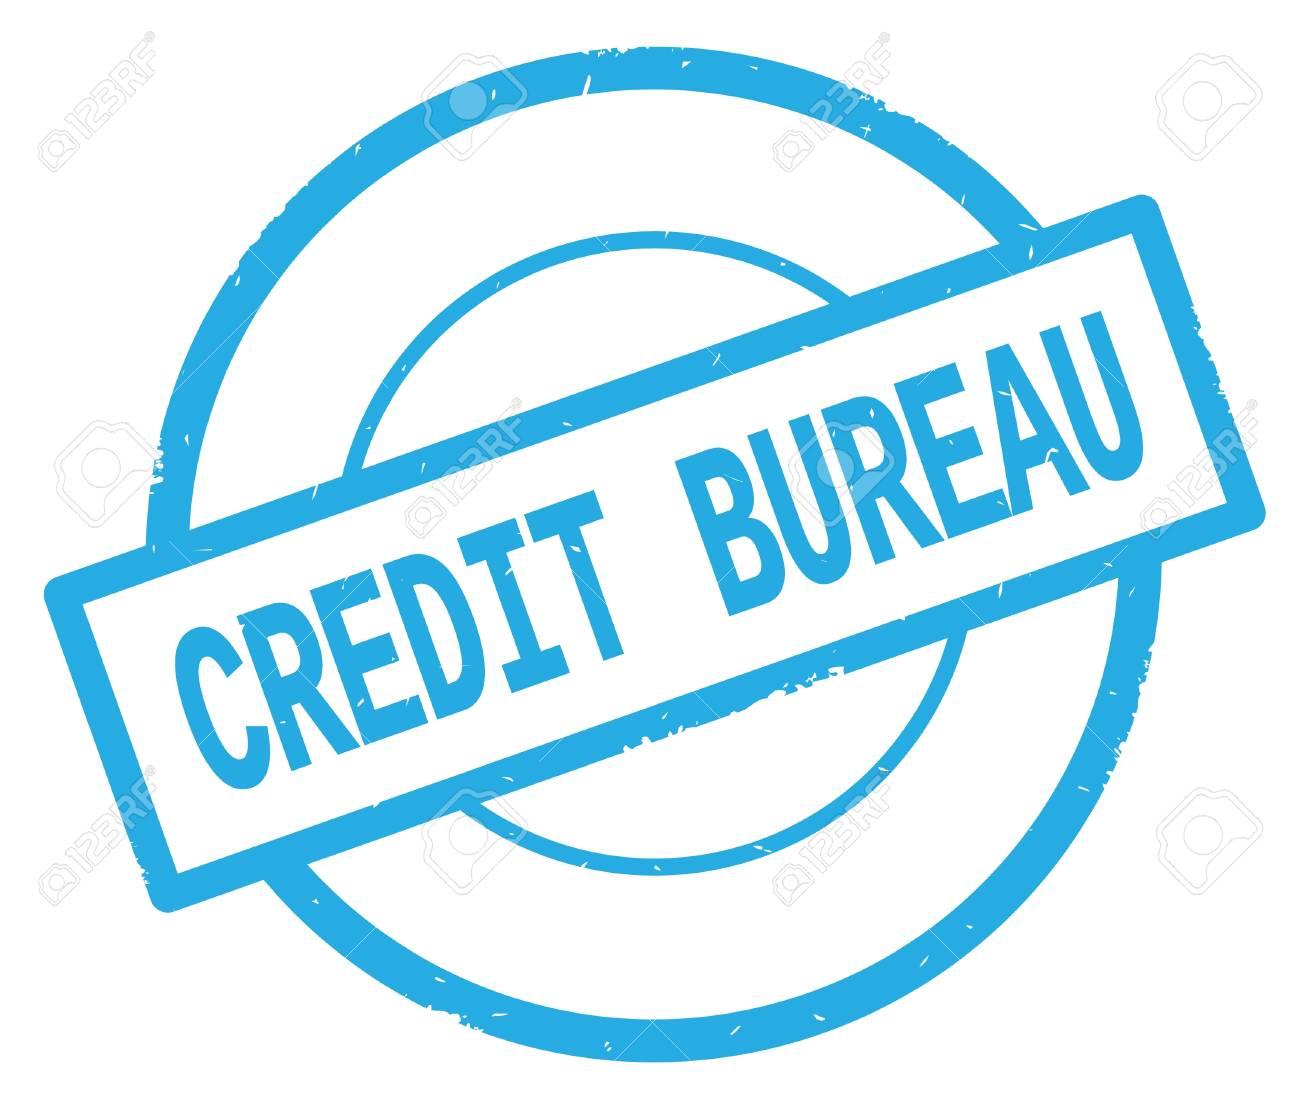 CREDIT BUREAU Text, Written On Cyan Simple Circle Rubber Vintage